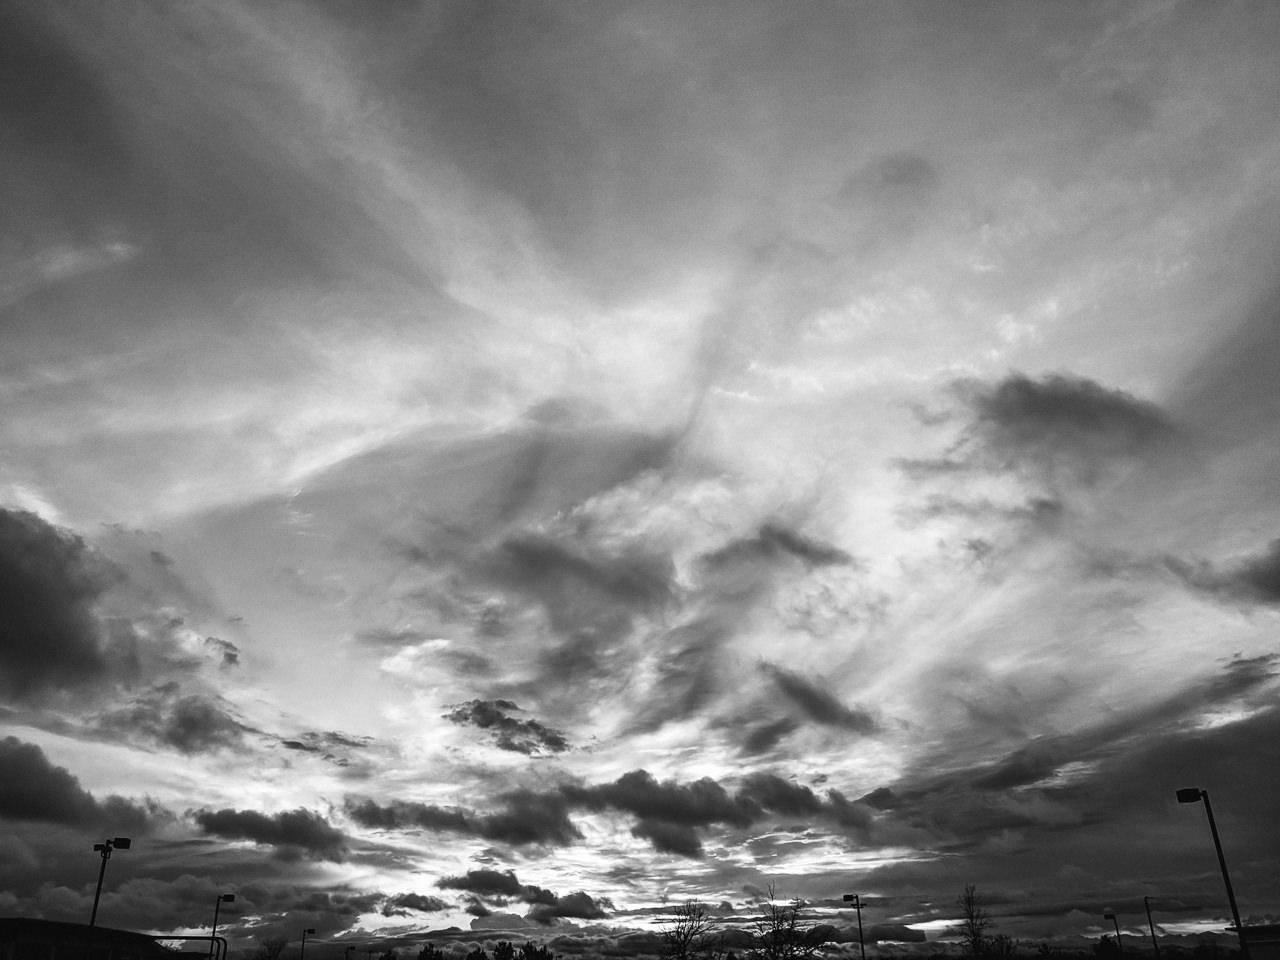 Day 118- 365 Day B&W Photo Challenge - Dramatic Spring Sunset in Denver - Google Pixel 3, VSCO Kodak Tri-X 400 Film Simulation